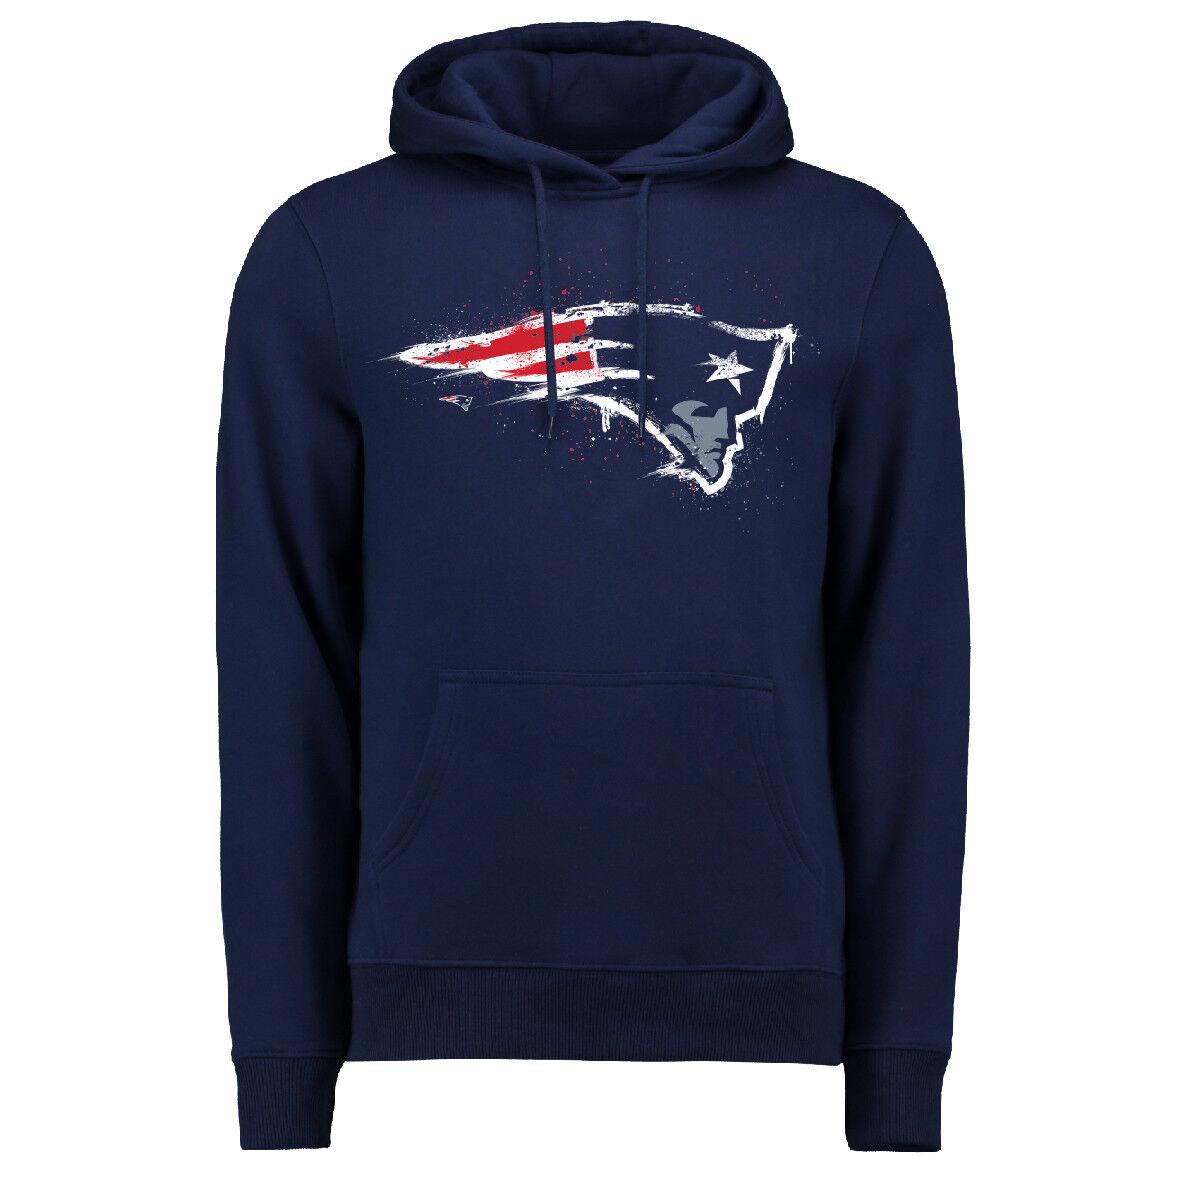 NFL Hoody New England Patriots Patriots Patriots Splatter Hoodie Kaputzenpullover hooded sweater 82ab02